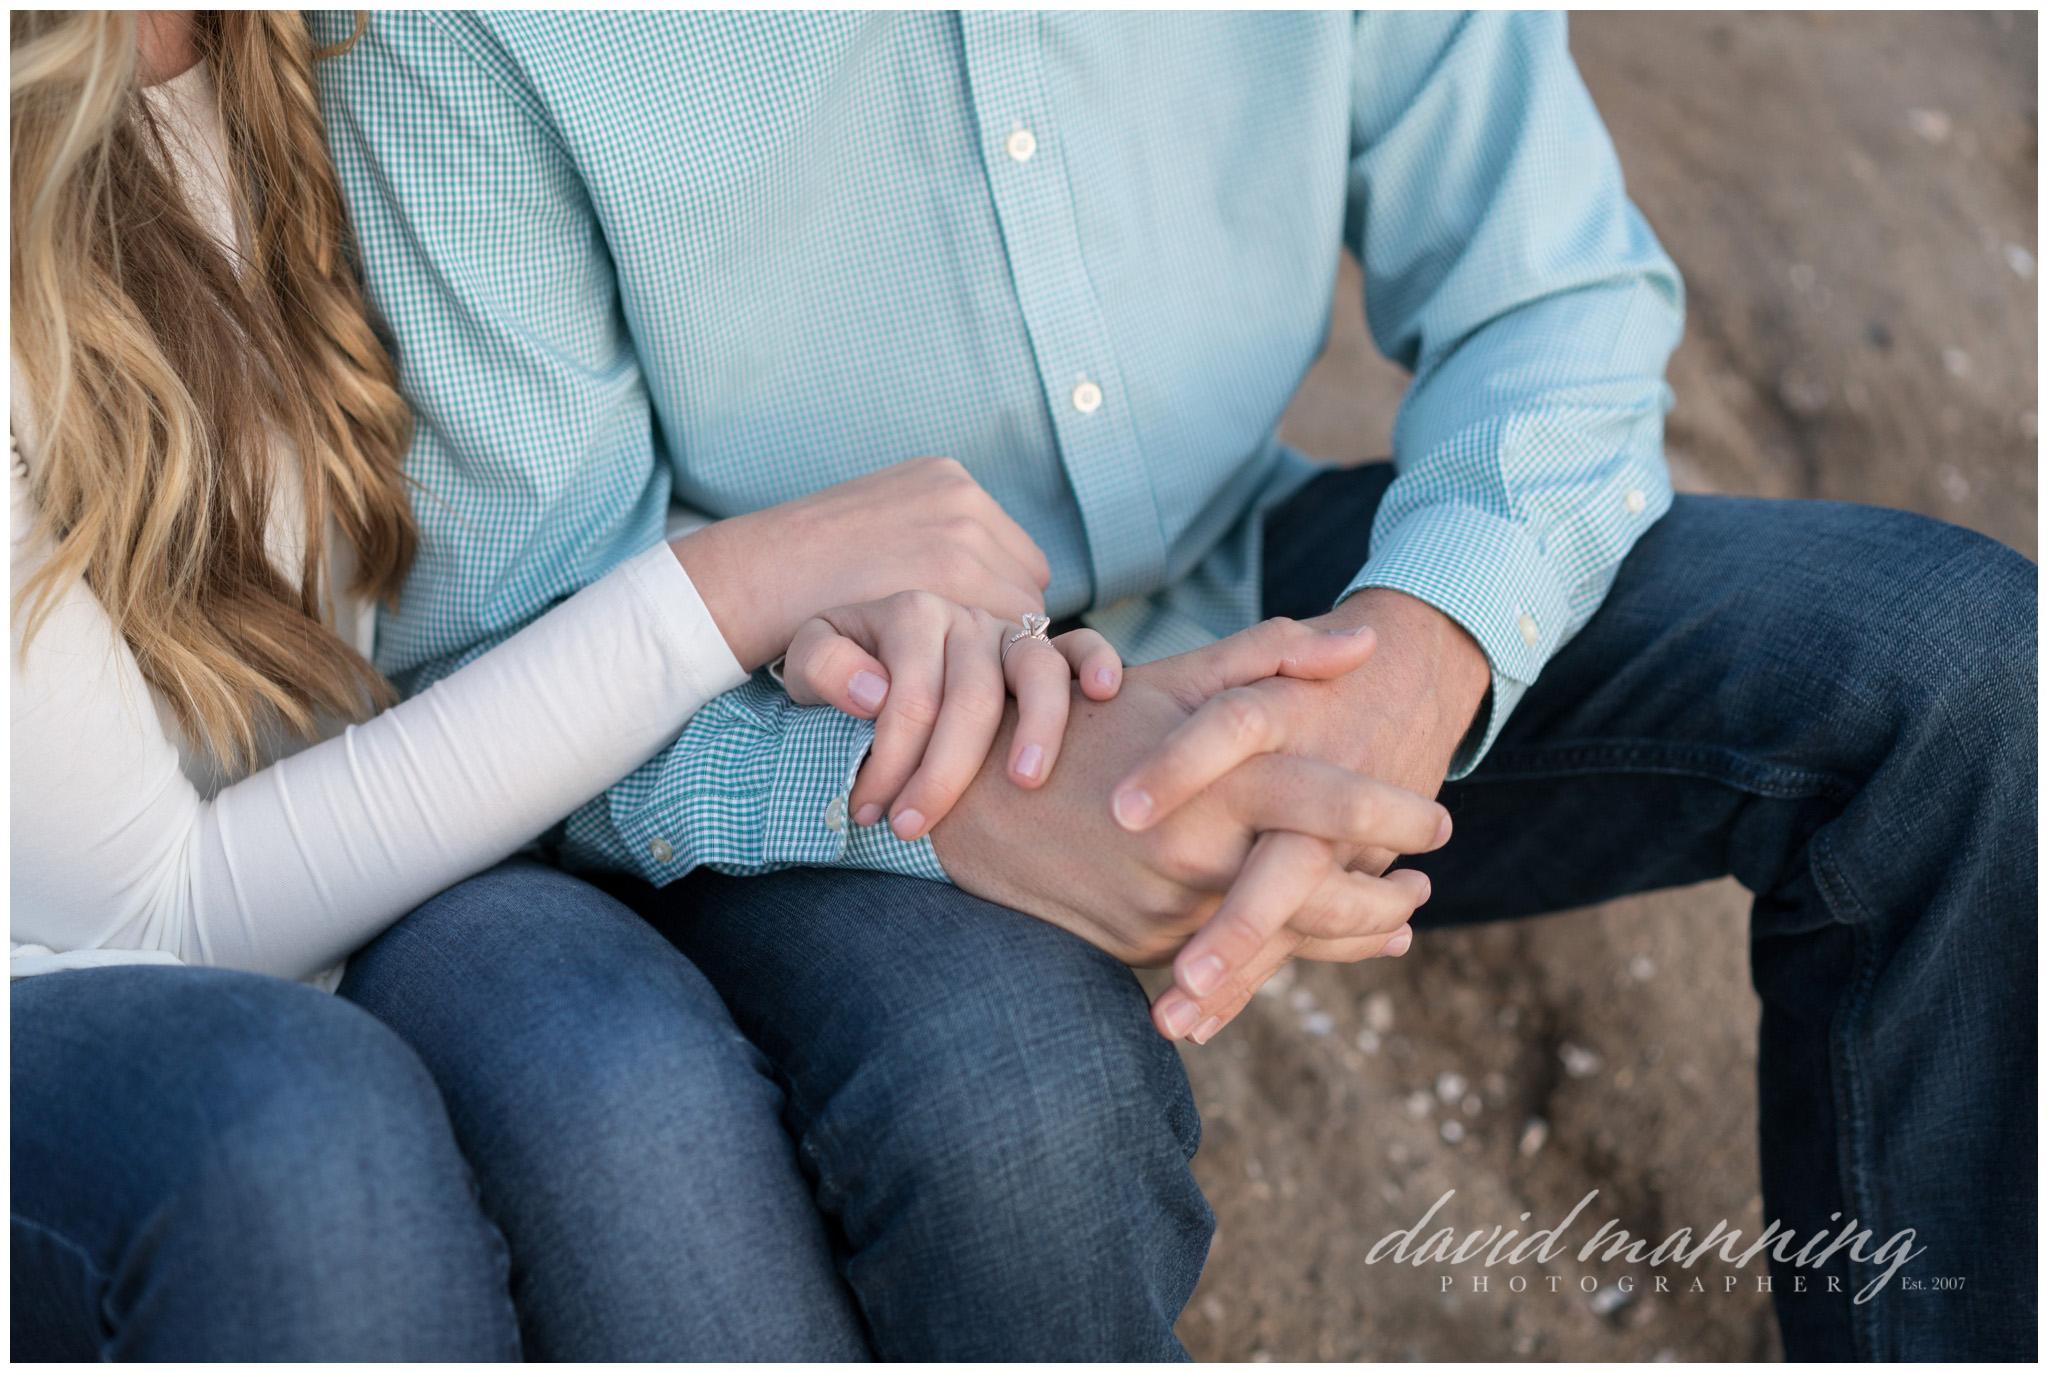 Alyssa-Taylor-Engagement-David-Manning-Photographer-0148.JPG